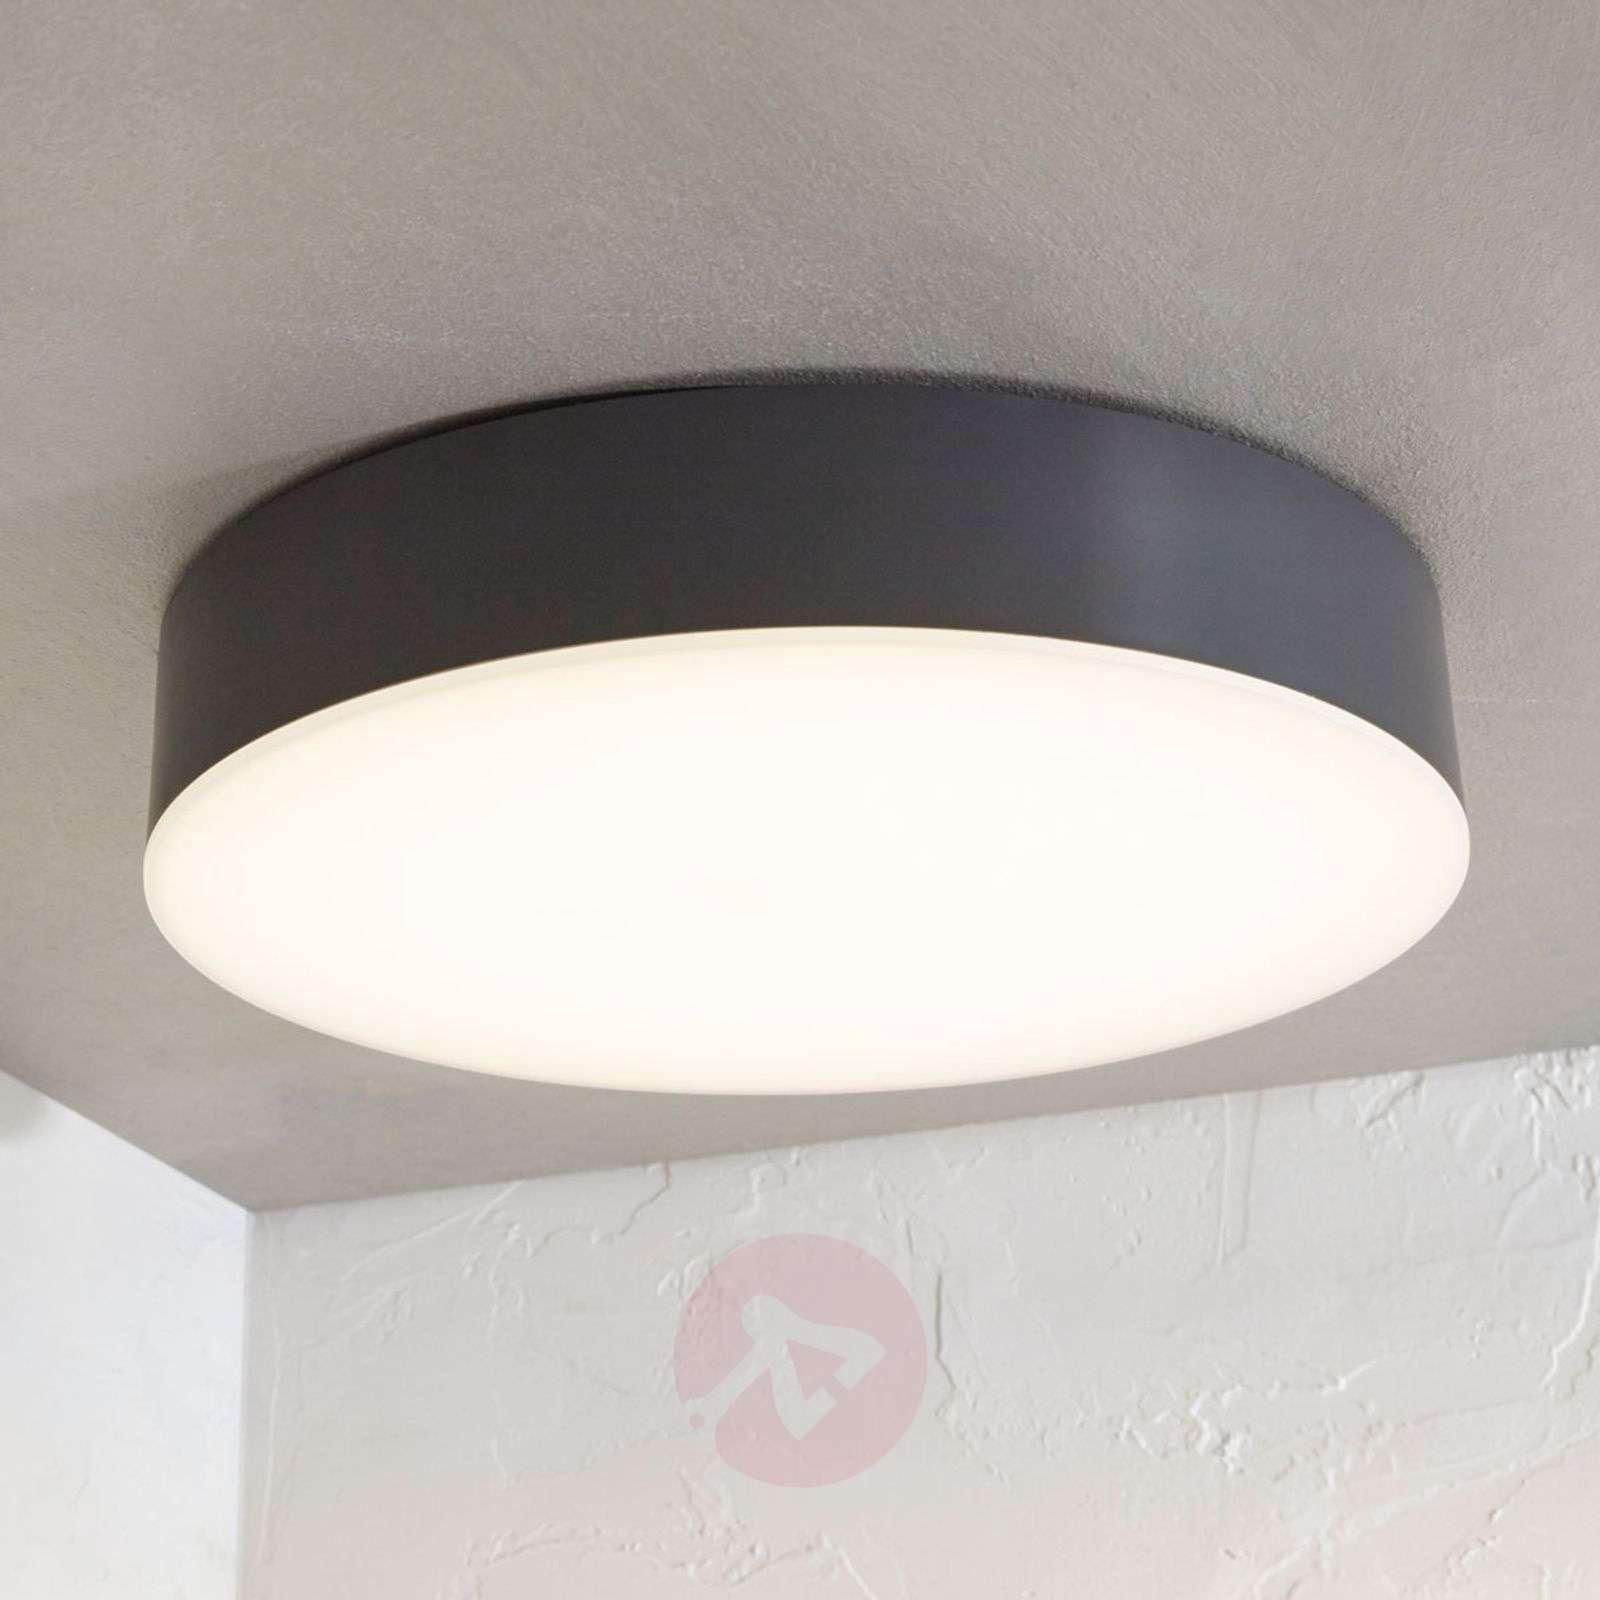 LED-ulkokattovalaisin Lahja, IP65, tummanharmaa-9949016-01